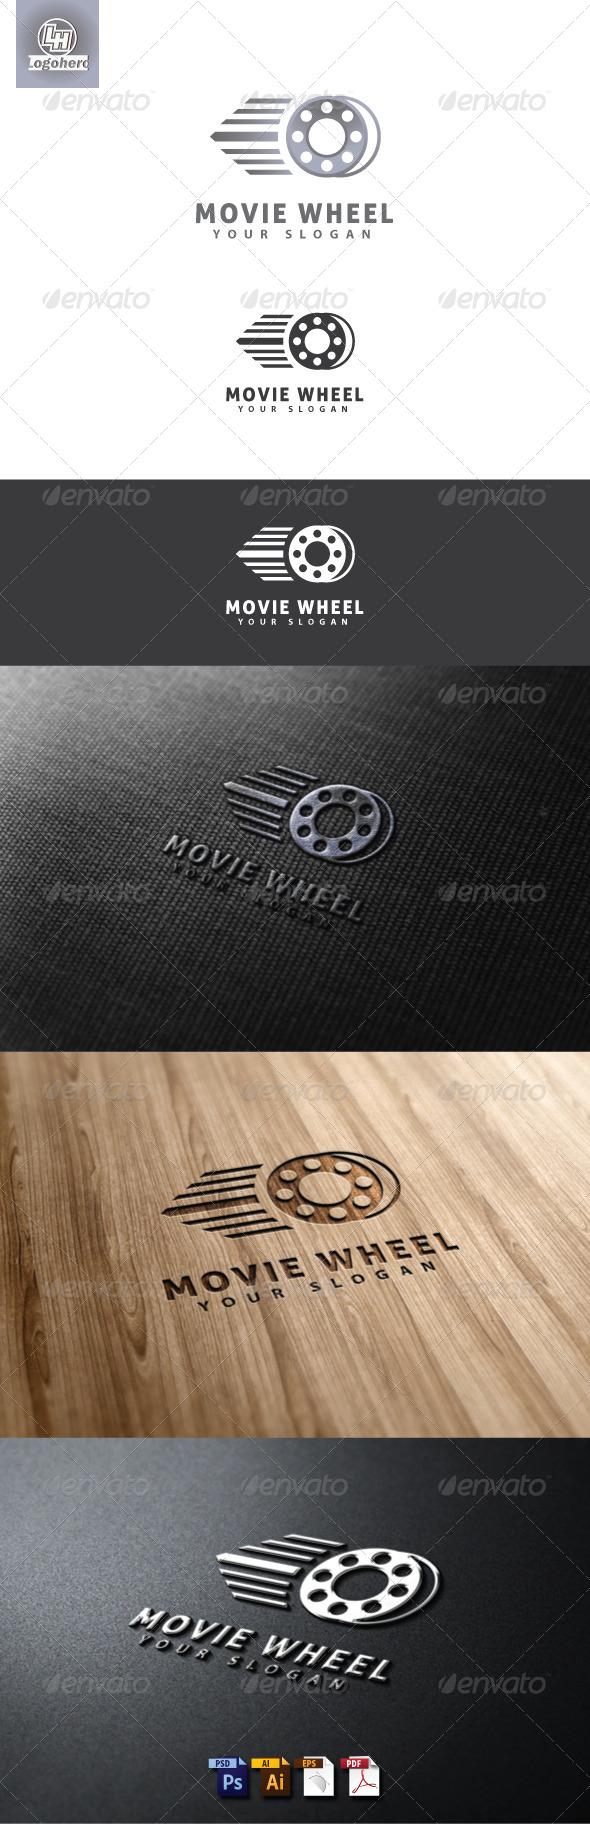 Movie Wheel Logo Template - Objects Logo Templates